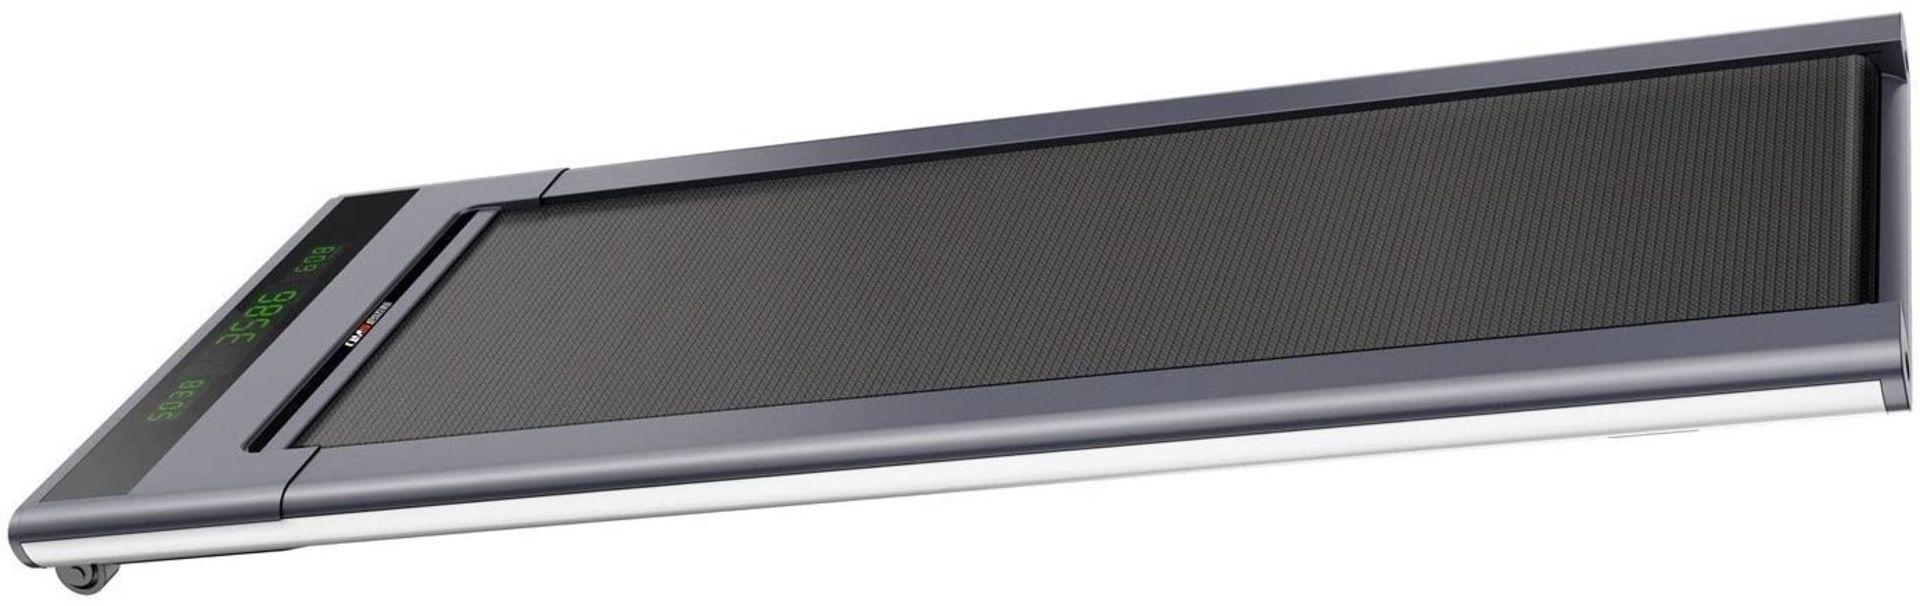 1 x Slim Tread Ultra Thin Smart Treadmill Running / Walking Machine - Lightweight With Folding - Image 21 of 23